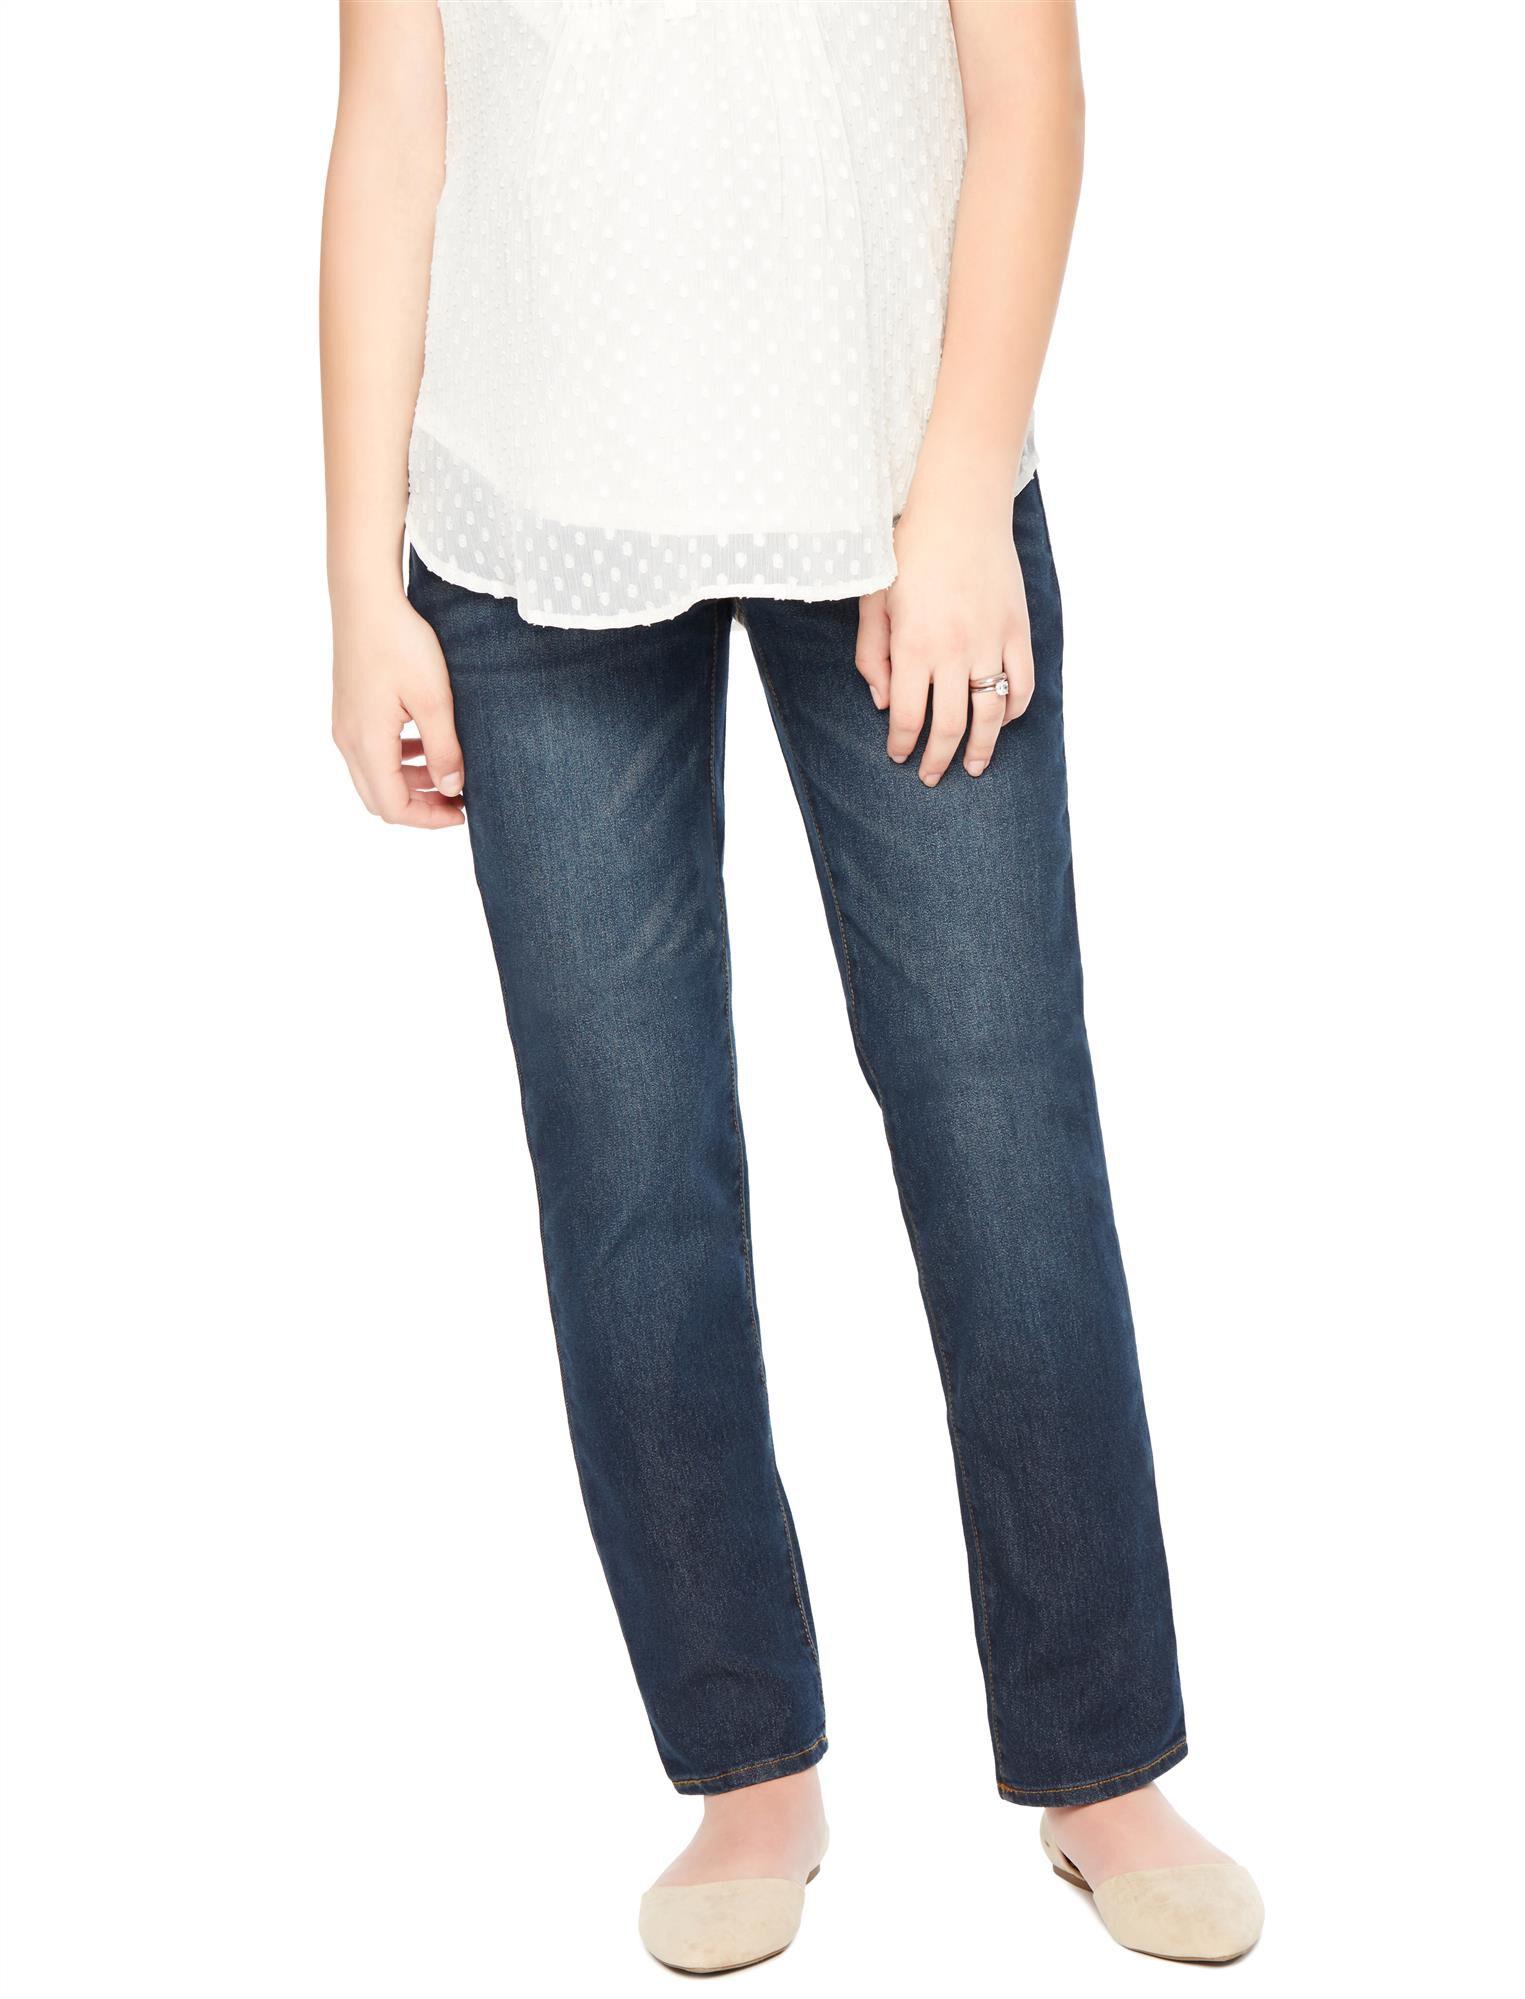 Indigo Blue Petite Secret Fit Belly Straight Leg Maternity Jeans